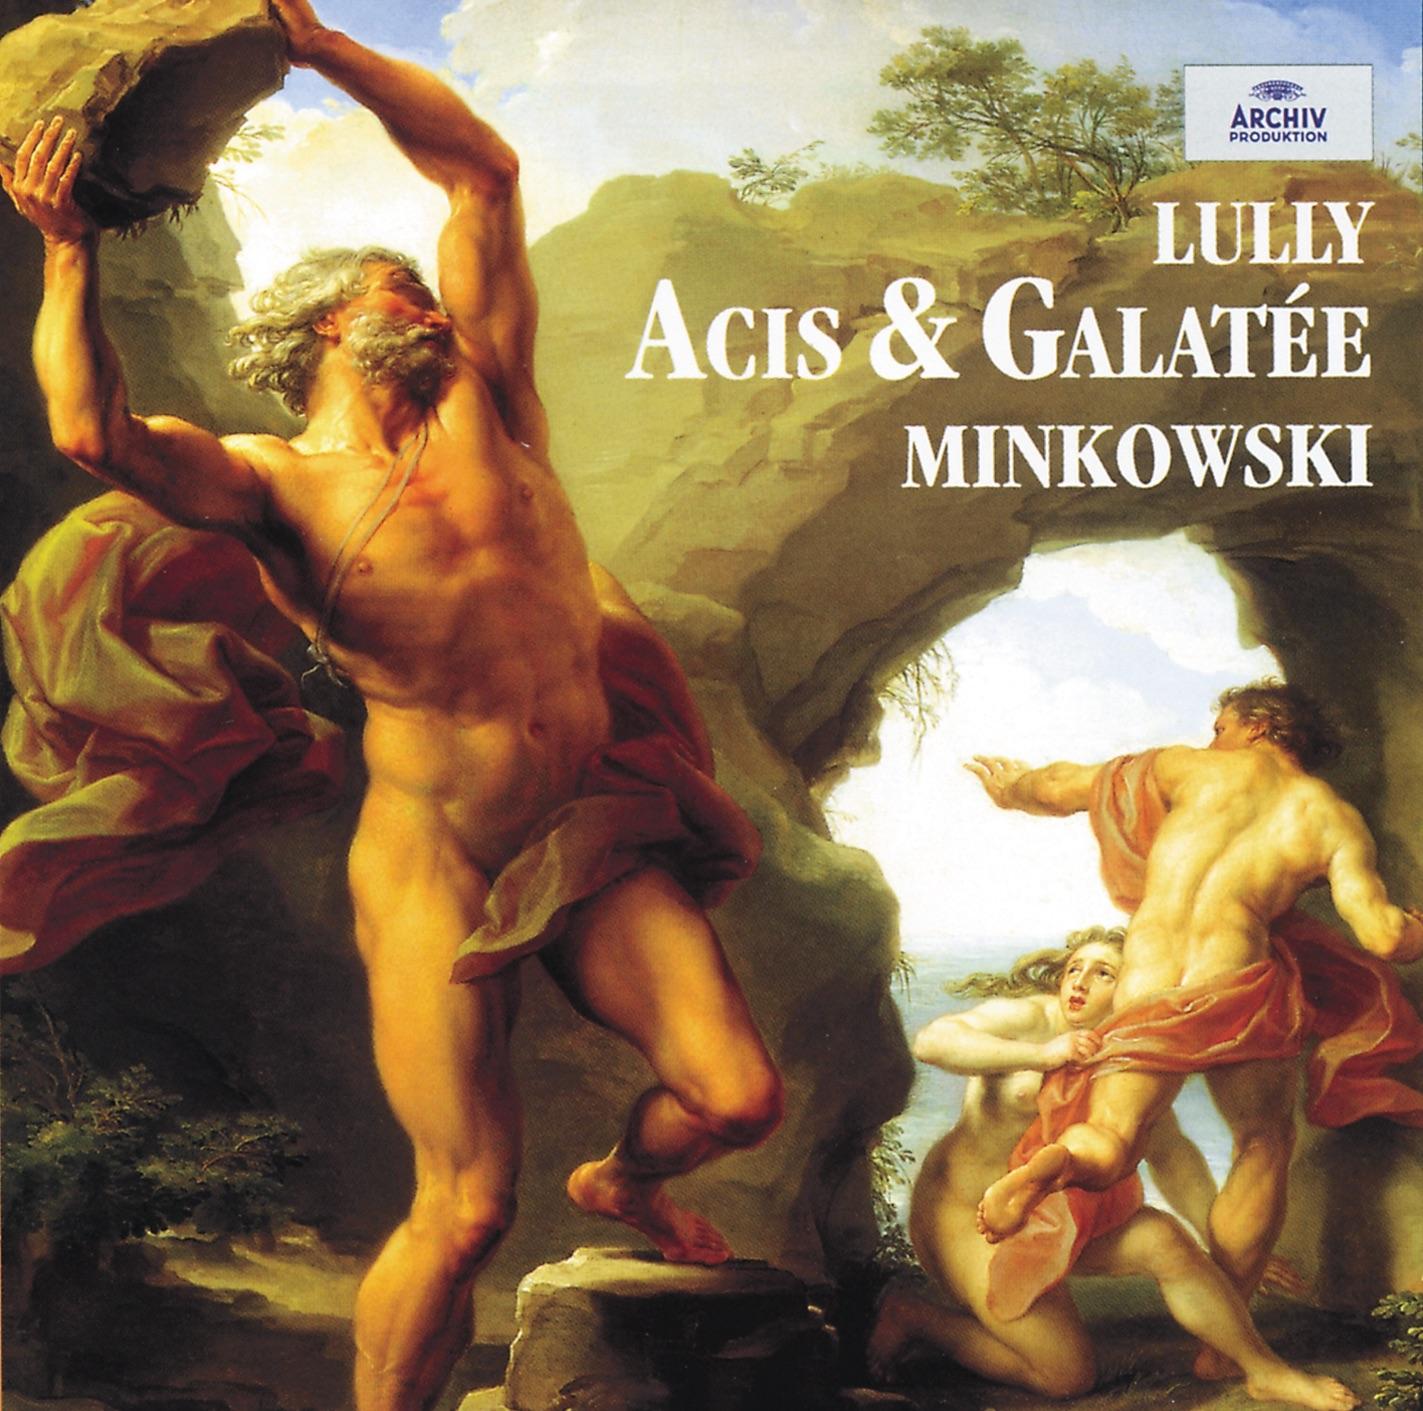 Acis & Galatée: